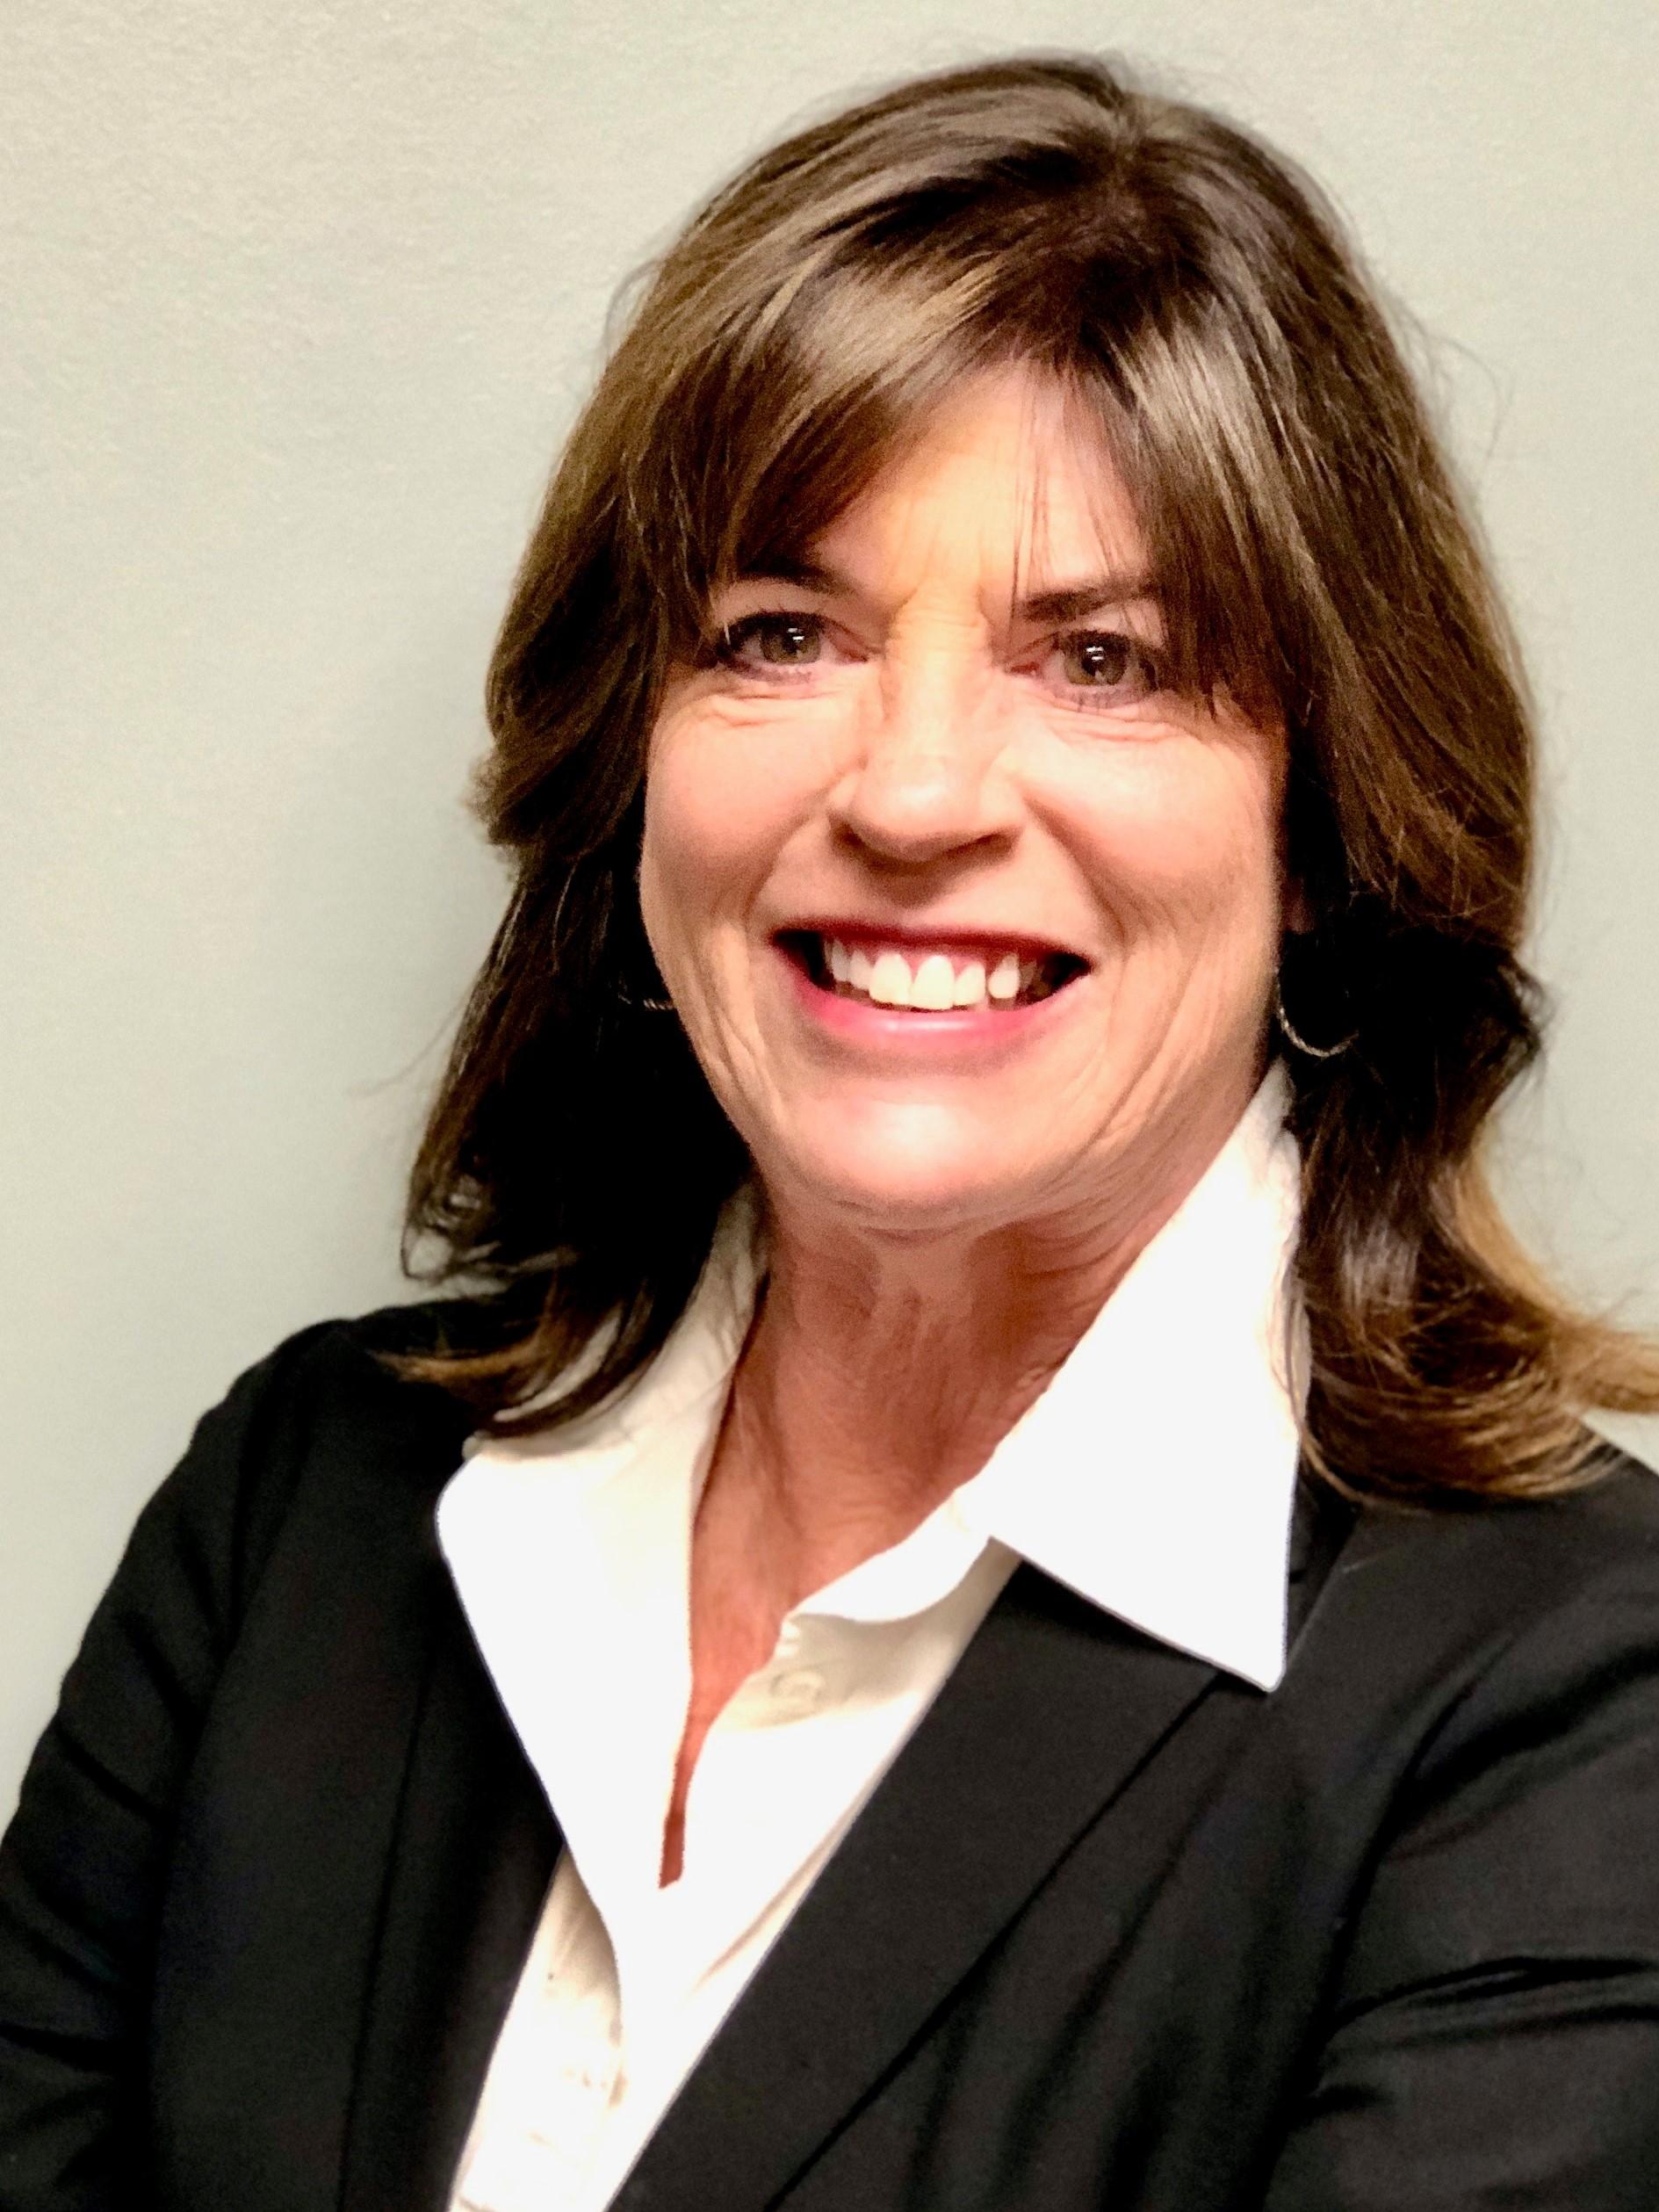 Kathy Turner, REALTOR